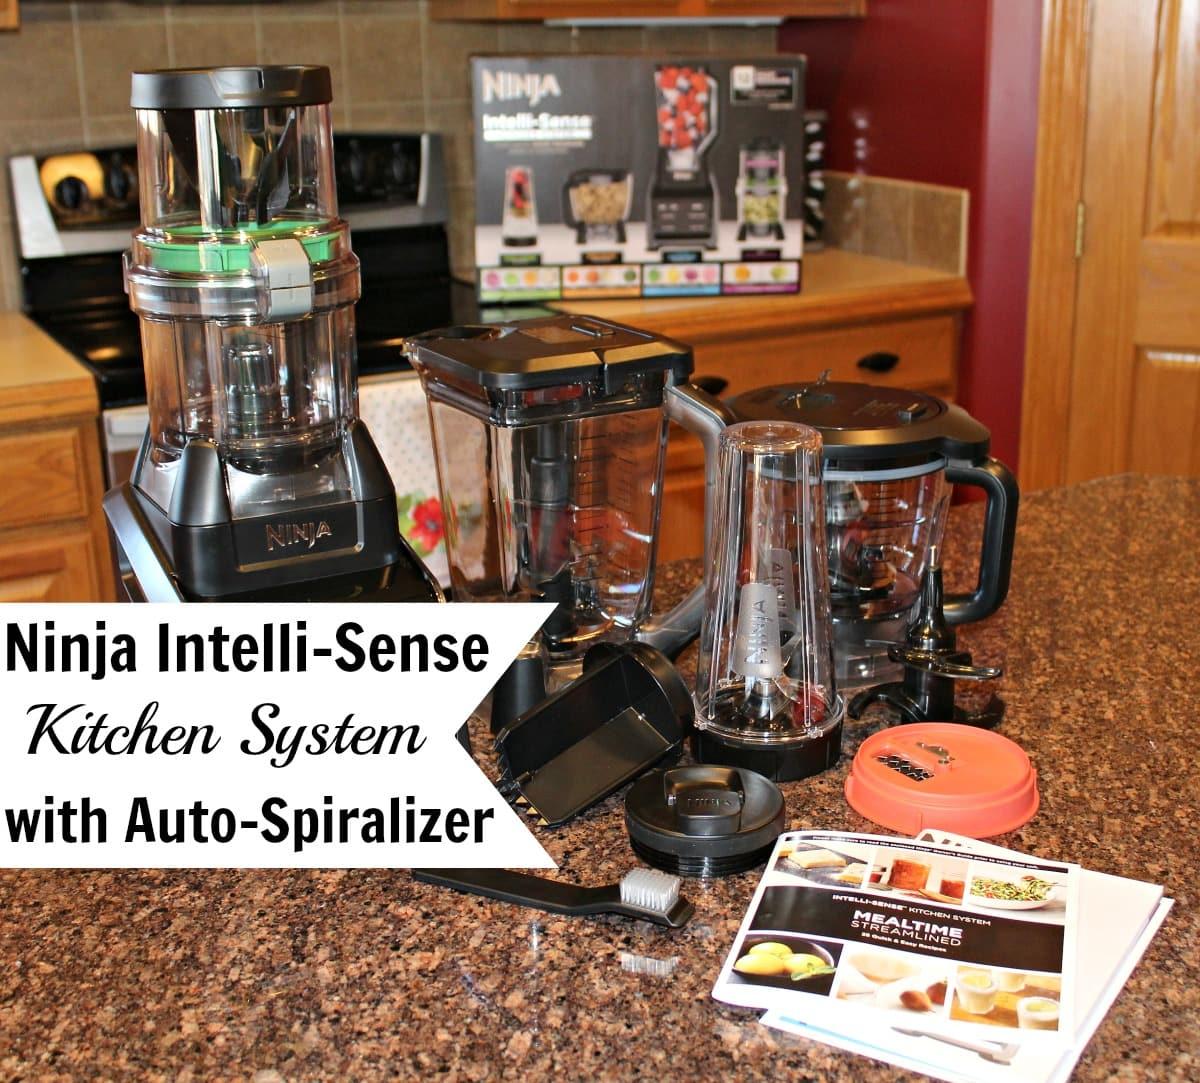 3 Family Friendly Uses For The Ninja Intelli-Sense Kitchen